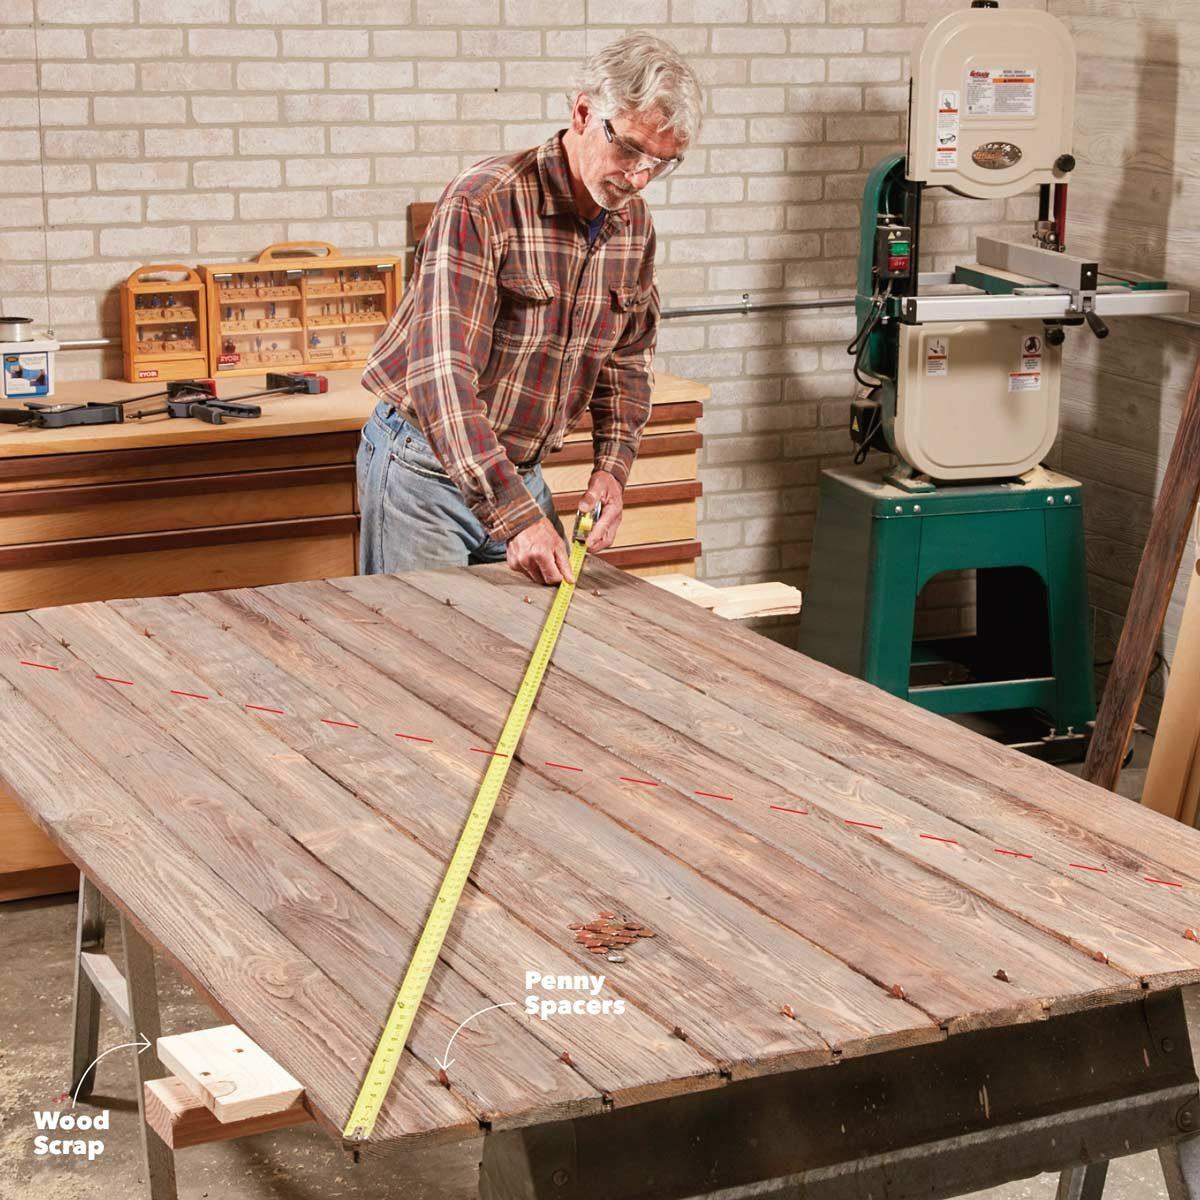 038_FHM_JUN17 assemble barn door